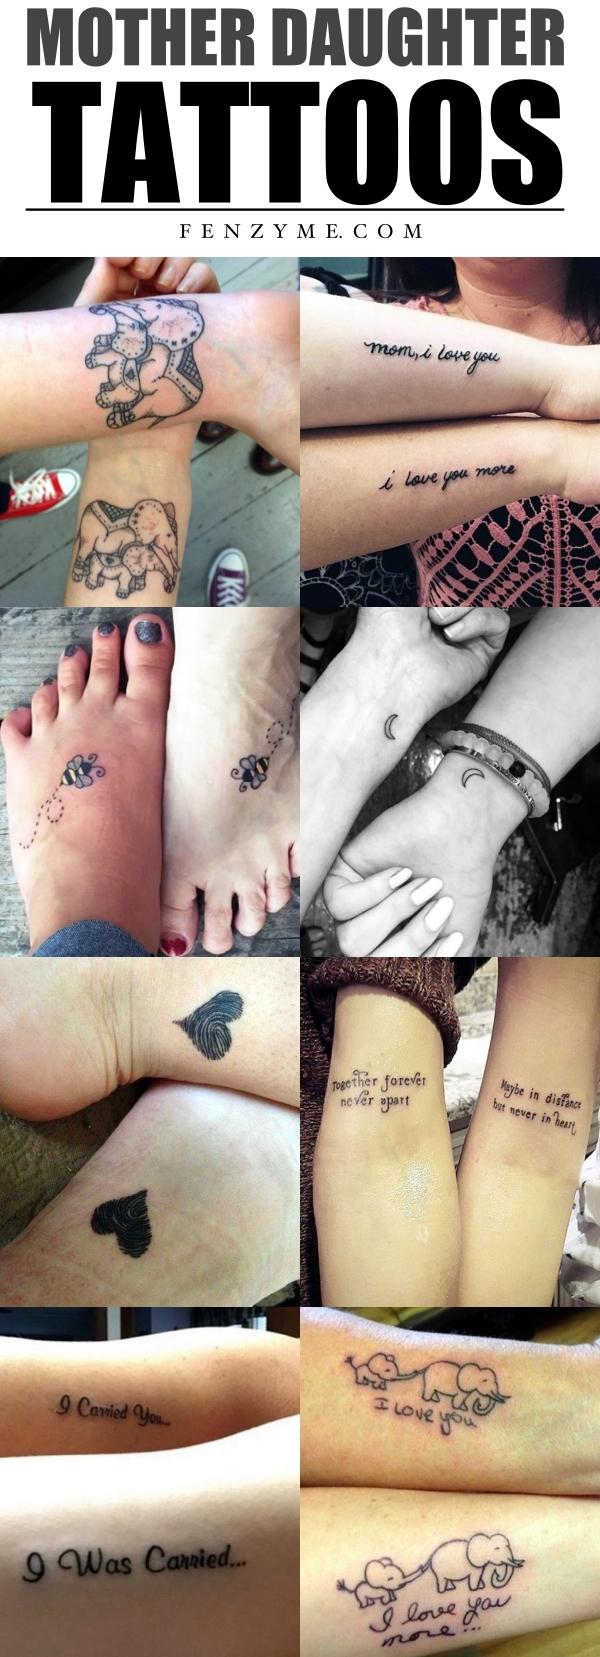 Mother Daughter Tattoos1